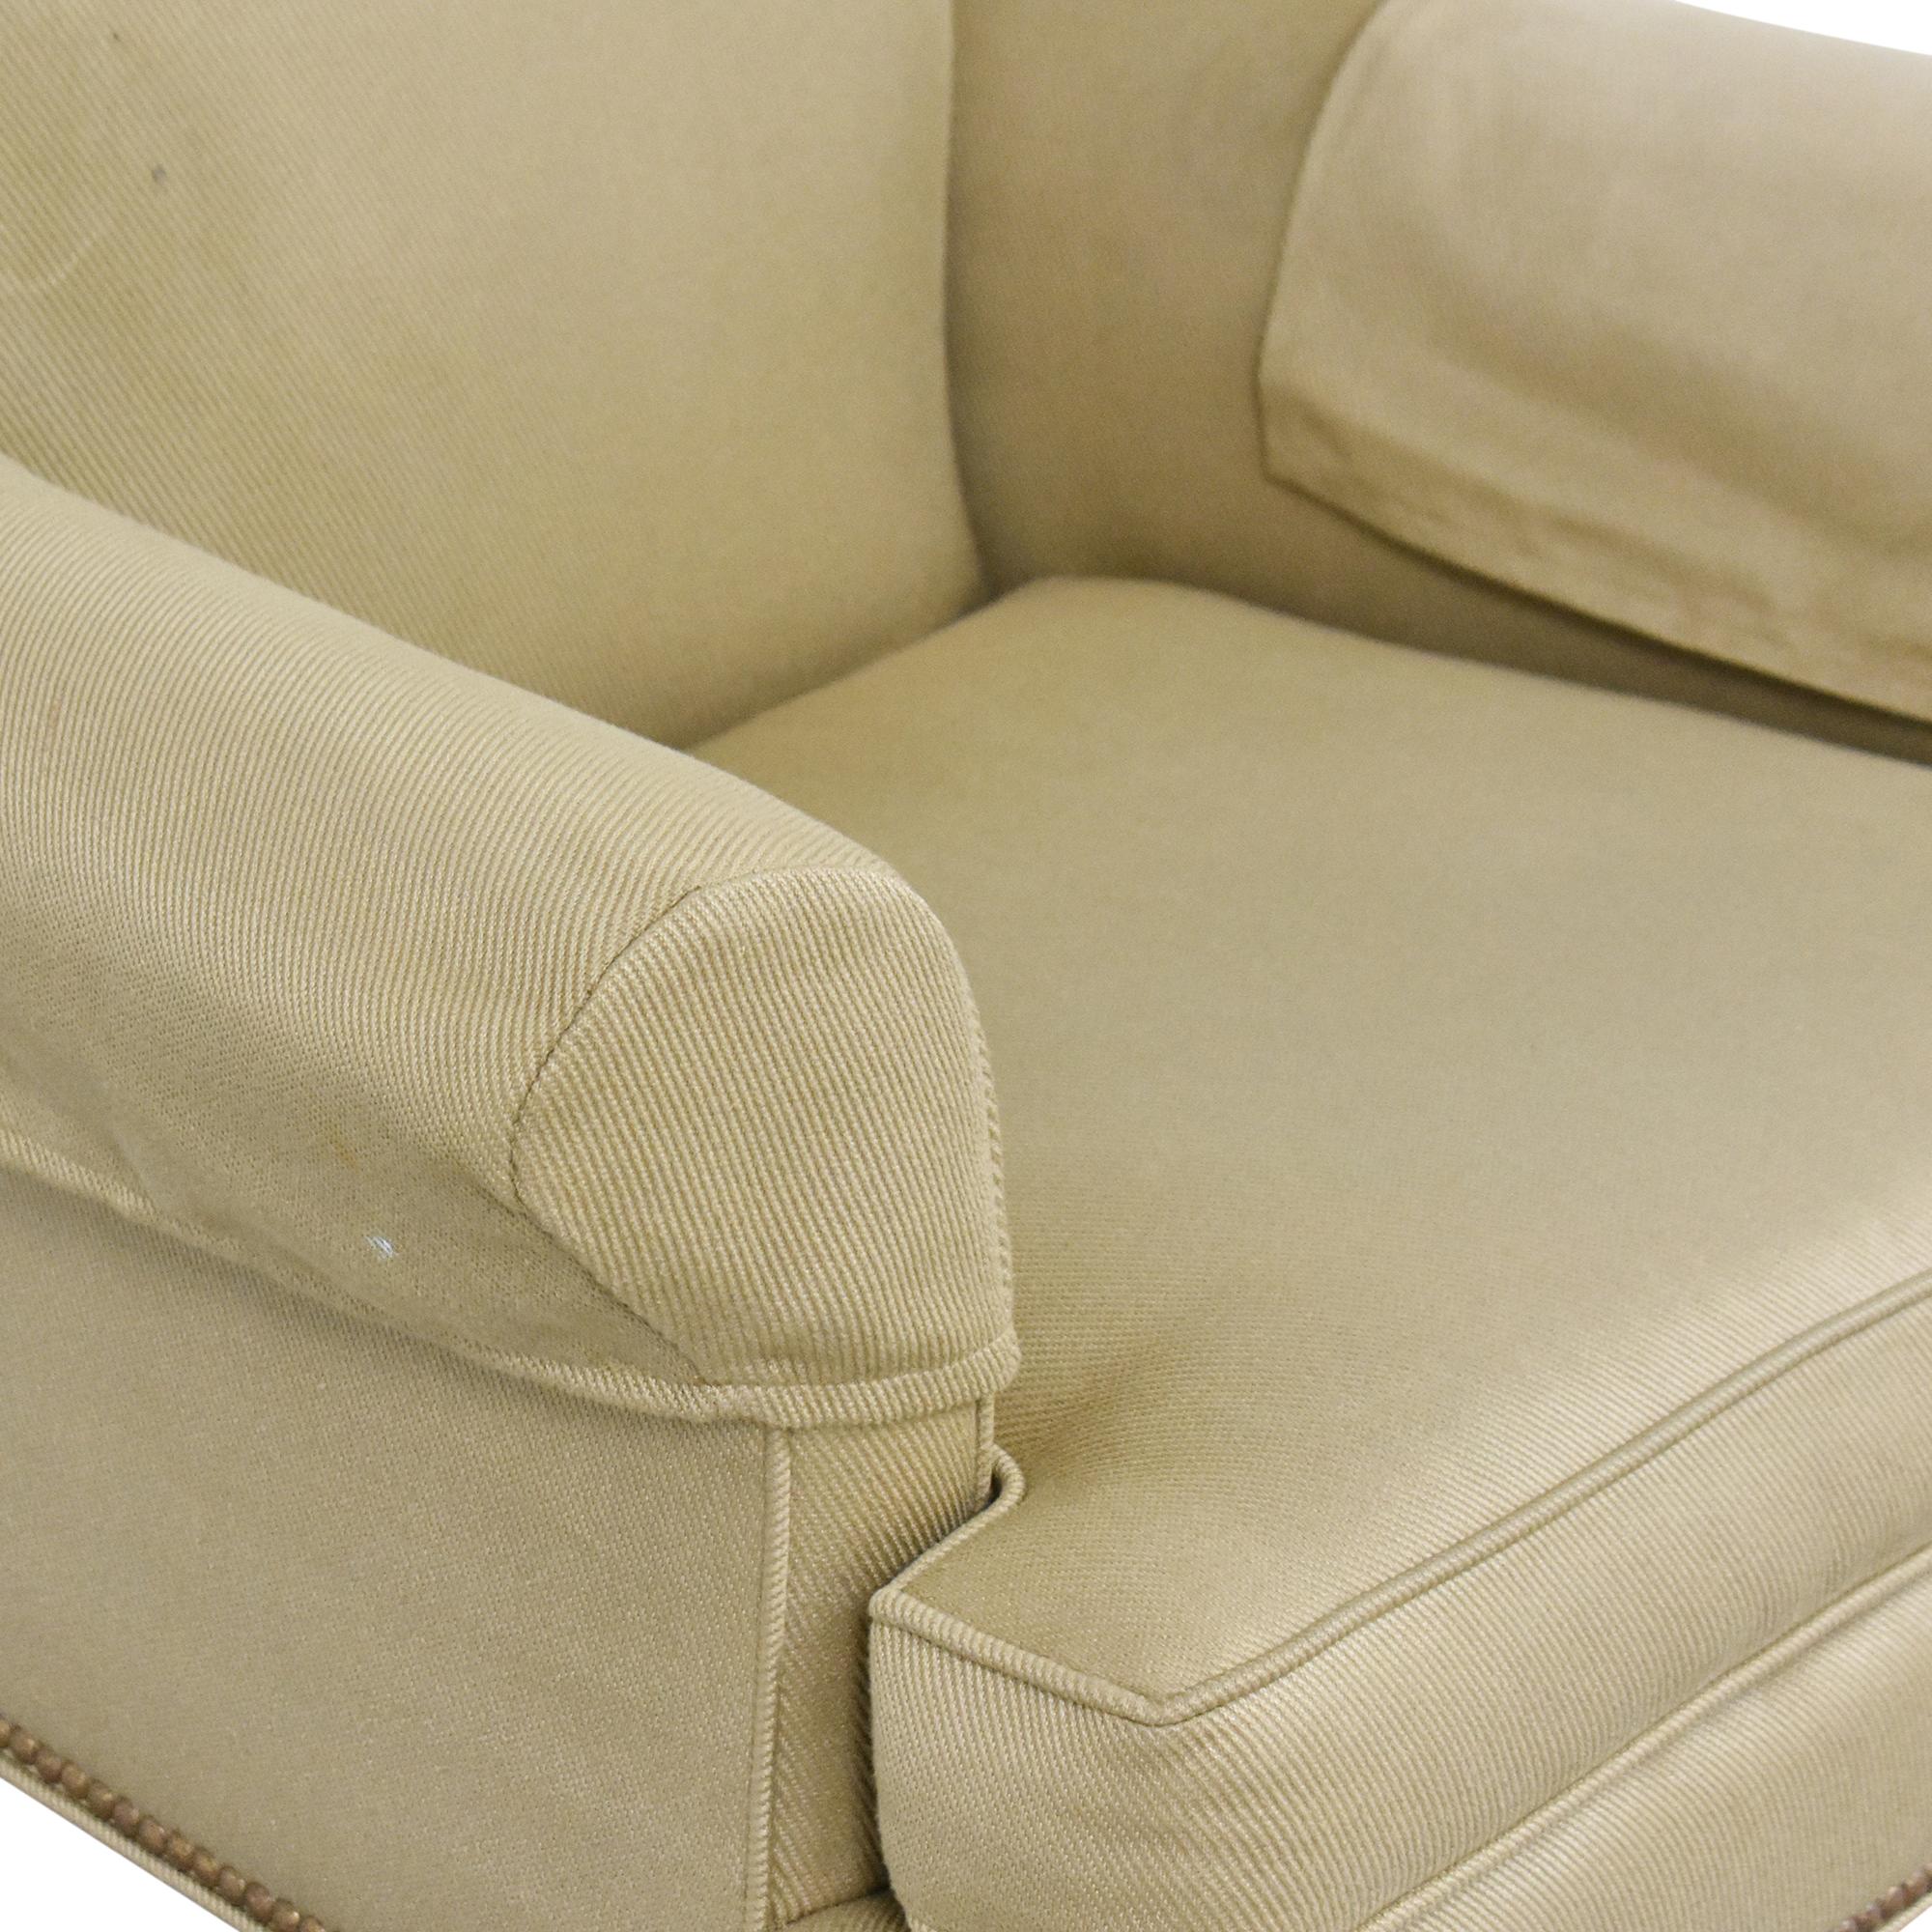 Ethan Allen Ethan Allen Wing Back Chair ma